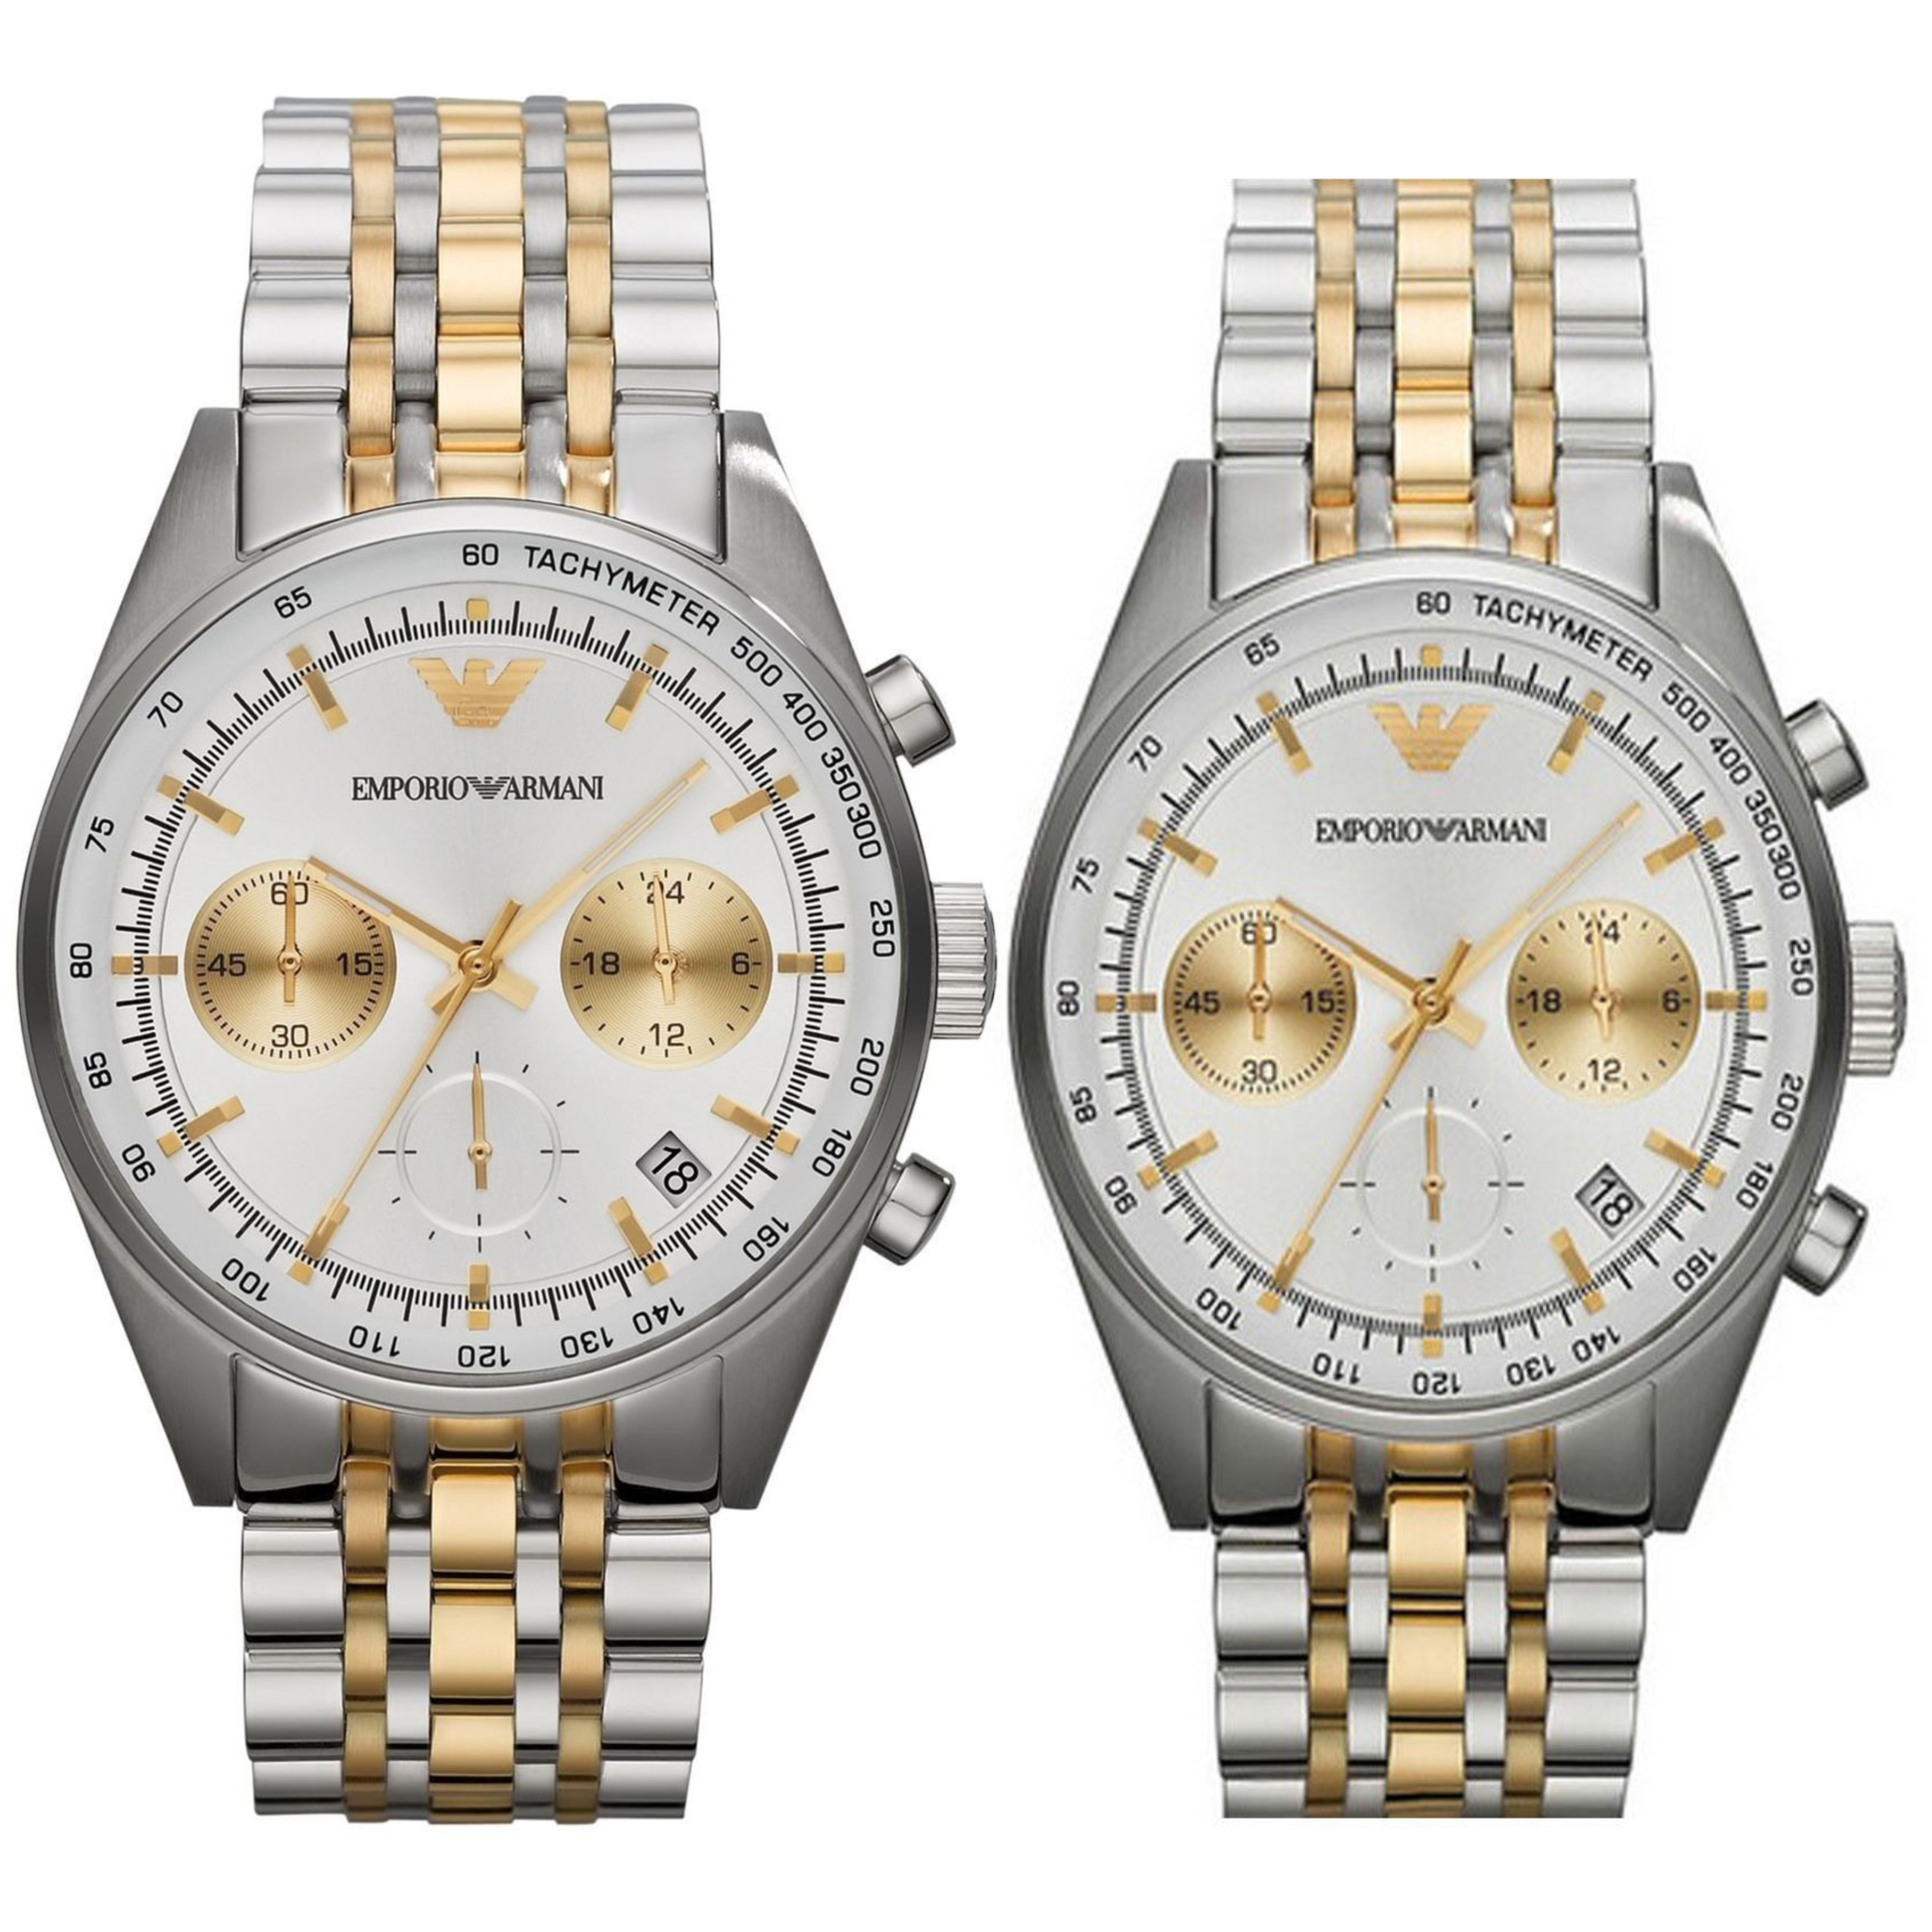 Emporio Armani Sportivo Couple Watch | Chronograph | Tachymeter Dial | Dual Tone Strap